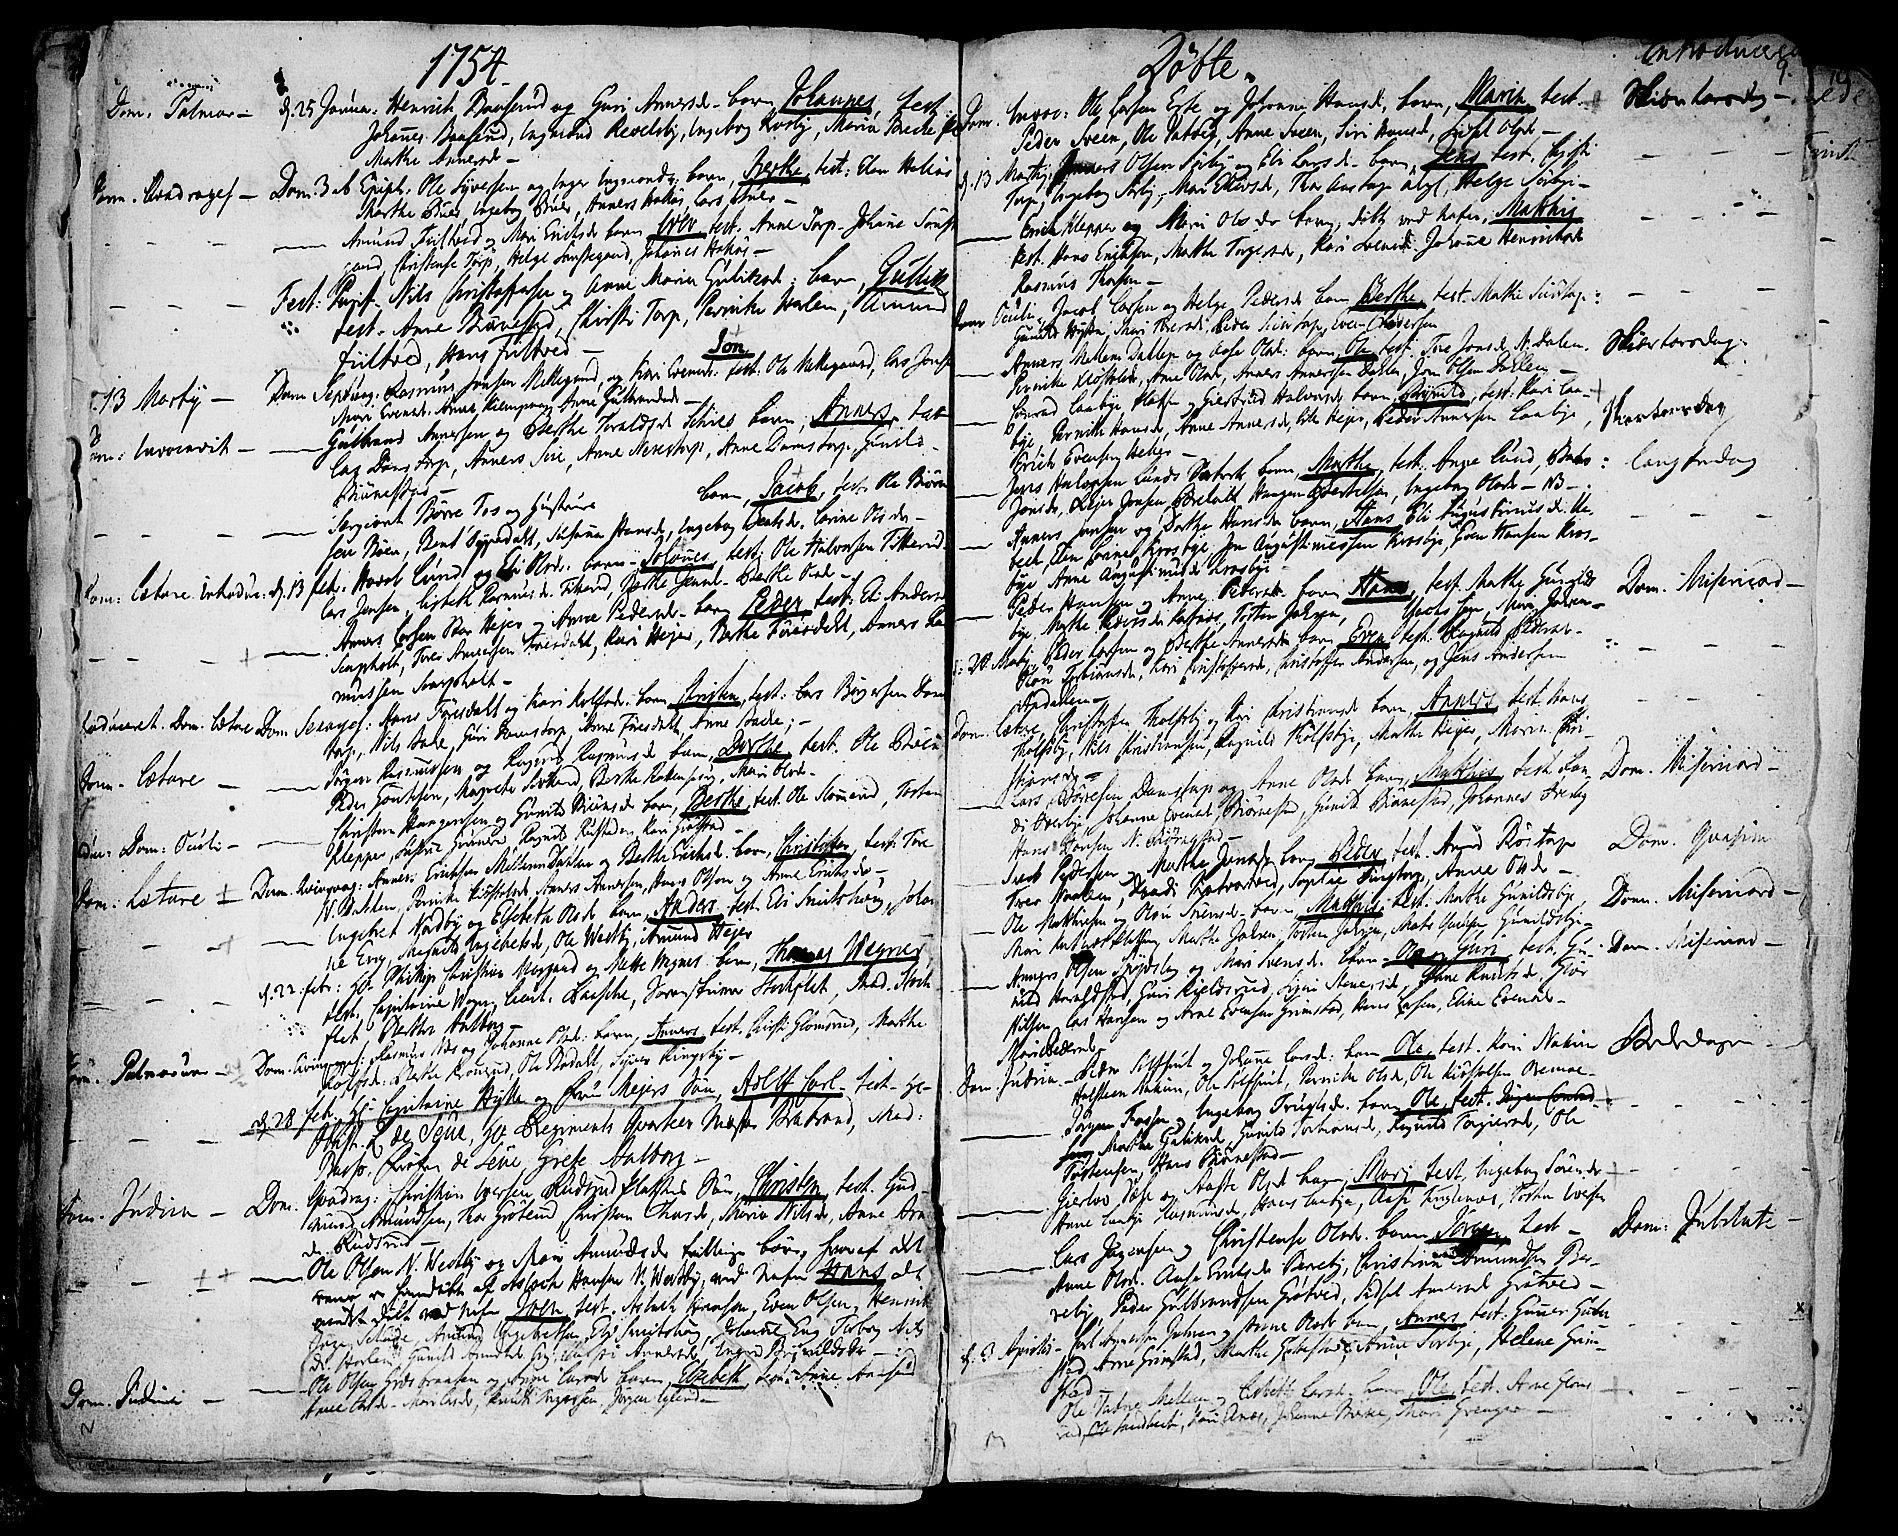 SAO, Rakkestad prestekontor Kirkebøker, F/Fa/L0003: Ministerialbok nr. I 3, 1752-1777, s. 9